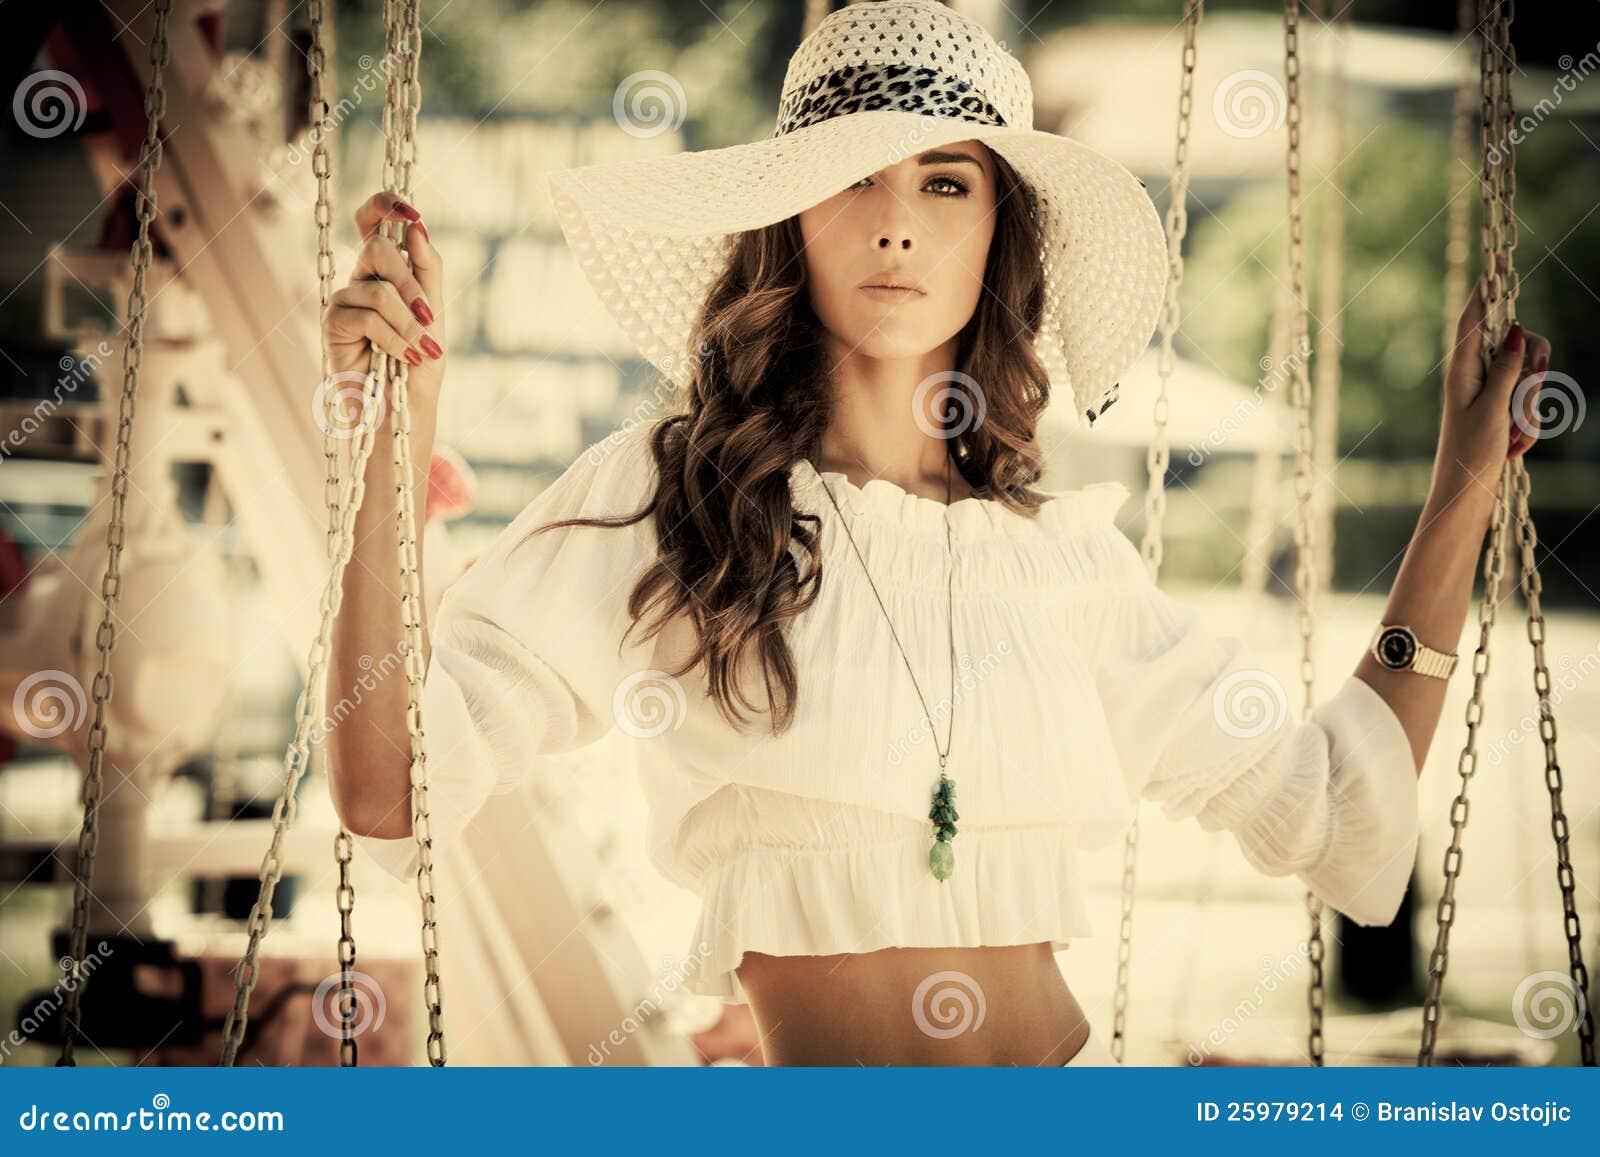 Fashion in amusement park